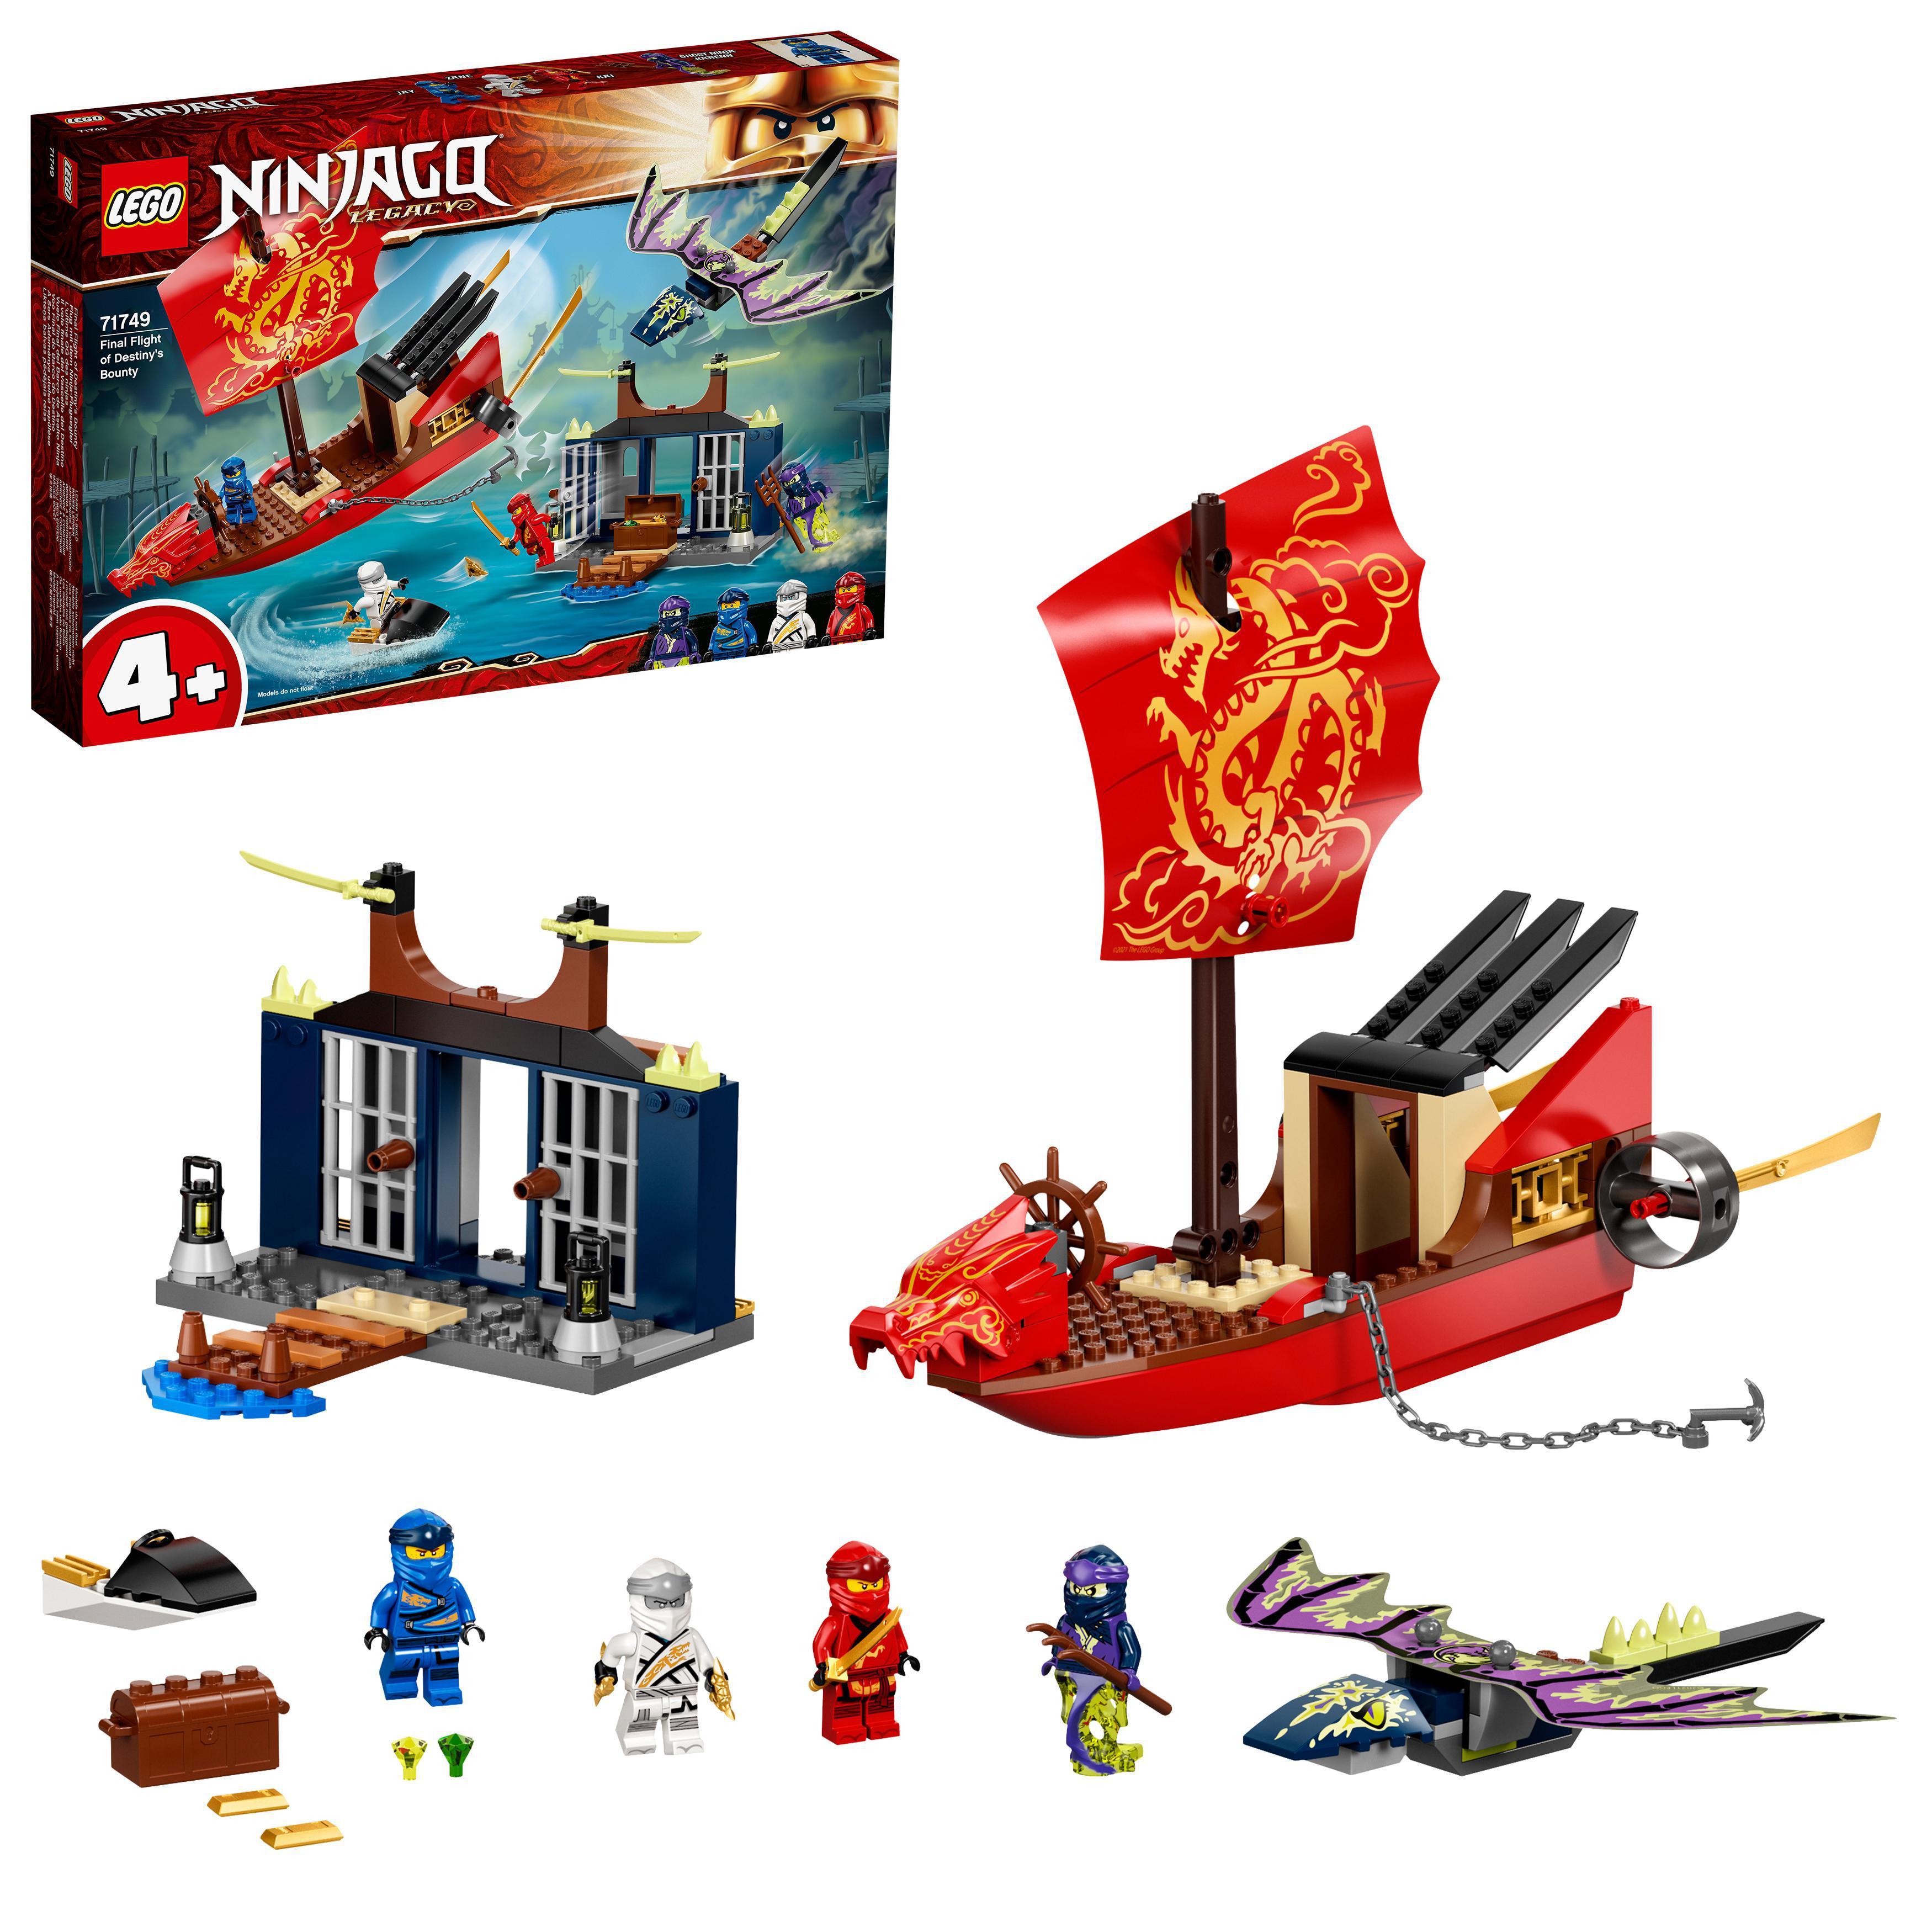 LEGO NINJAGO - Final Flight of Destiny's Bounty (71749)